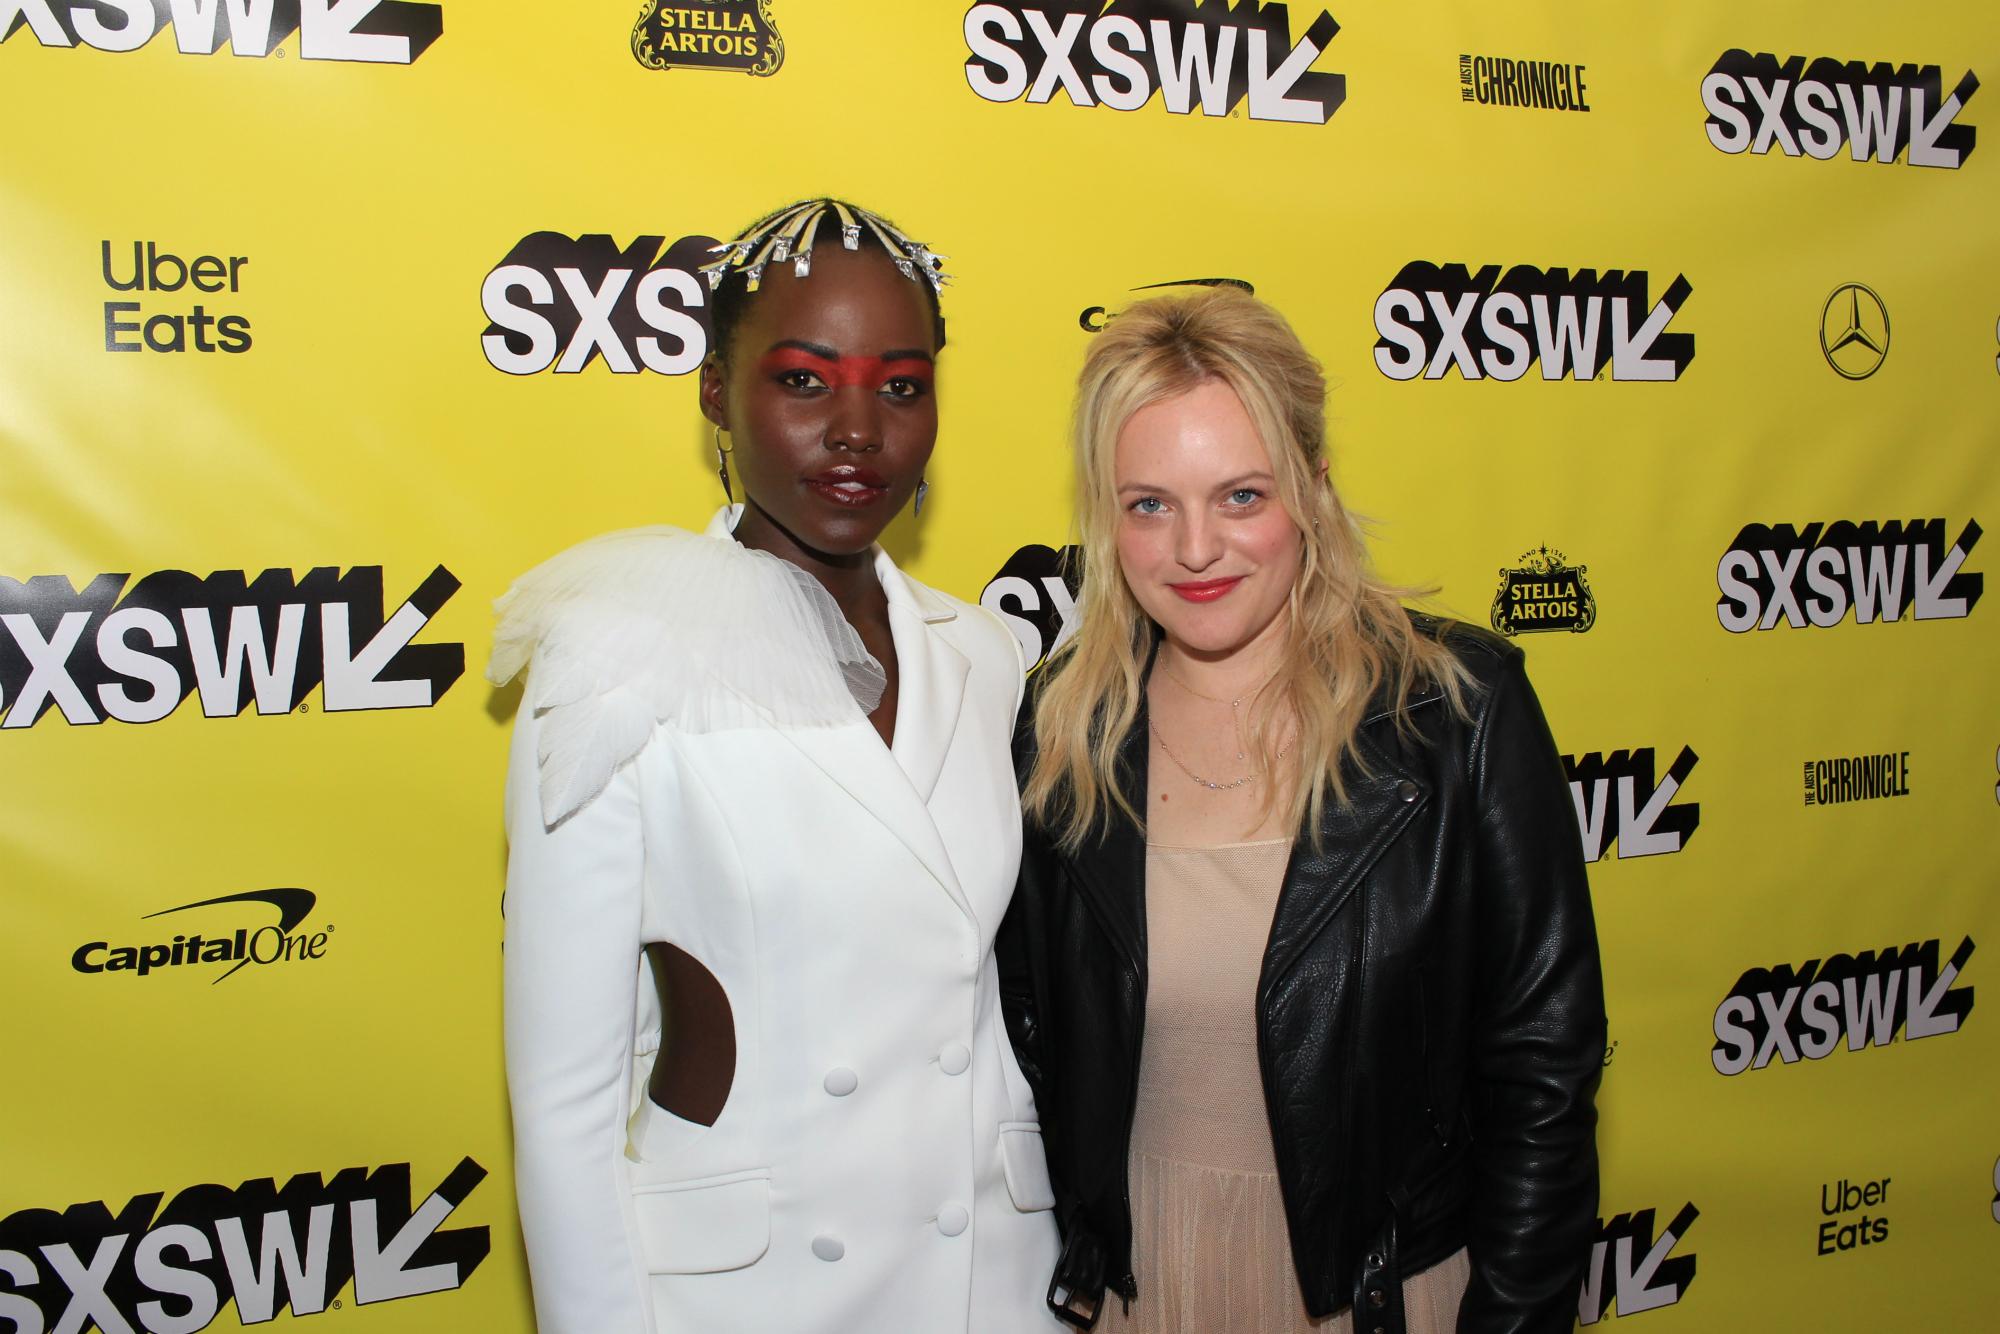 Us, Horror, Jordan Peele, Red Carpet Photo, SXSW 2019, Lupita Nyong'o, Elisabeth Moss